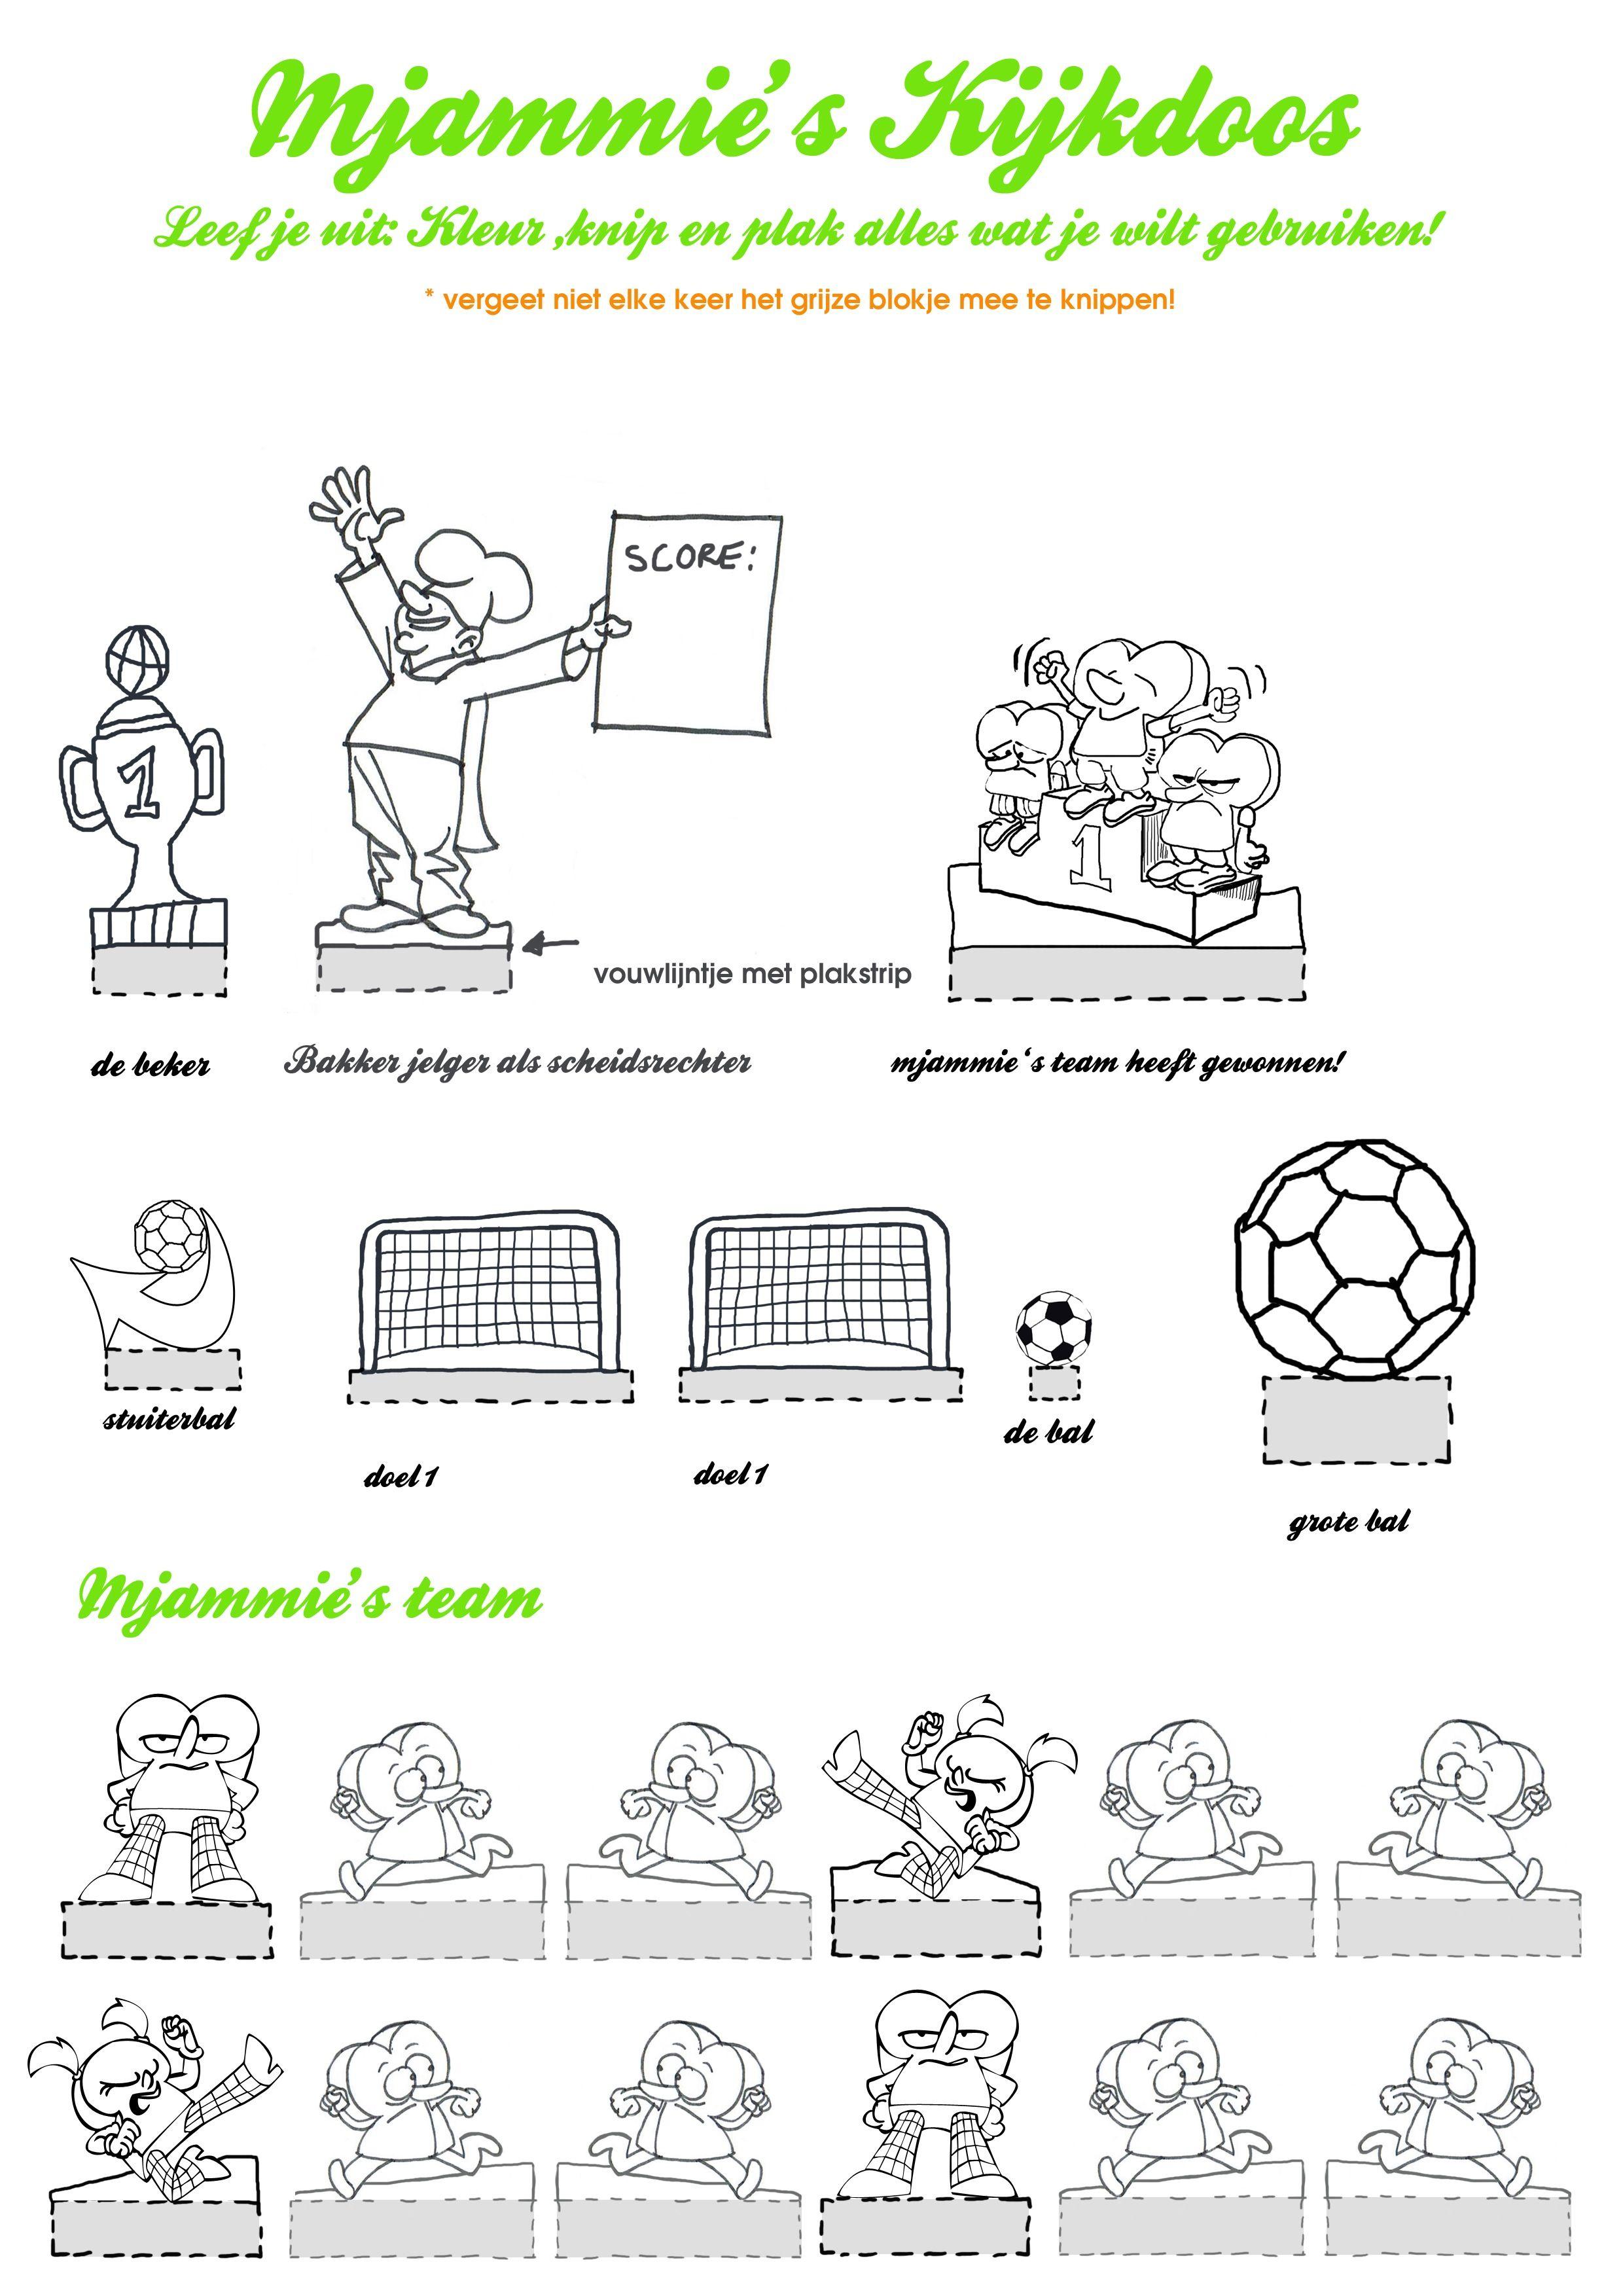 Pin Van Angelique En Jacco Bekkema Op Voetbal Knutselideeen Voetbal Sport Voetballers